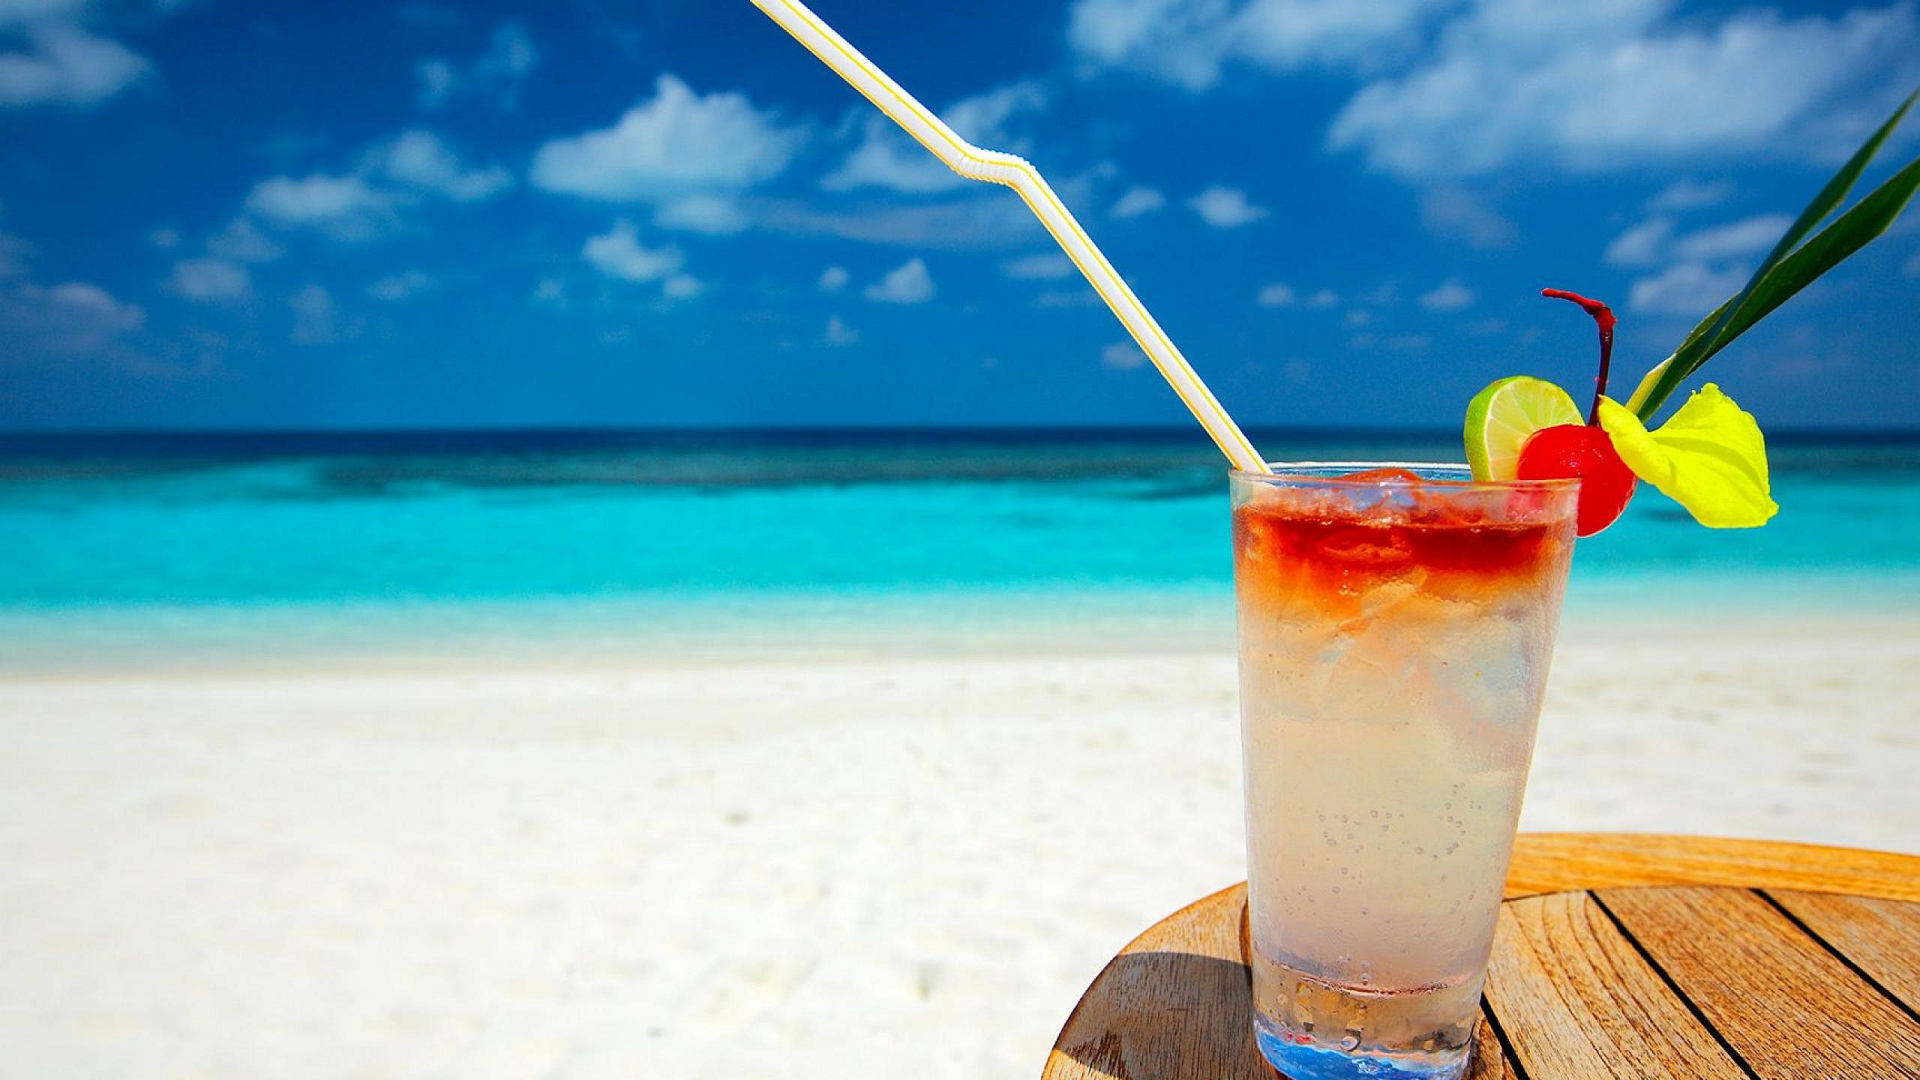 2560x1600px free wallpaper beach scenes downloads - wallpapersafari